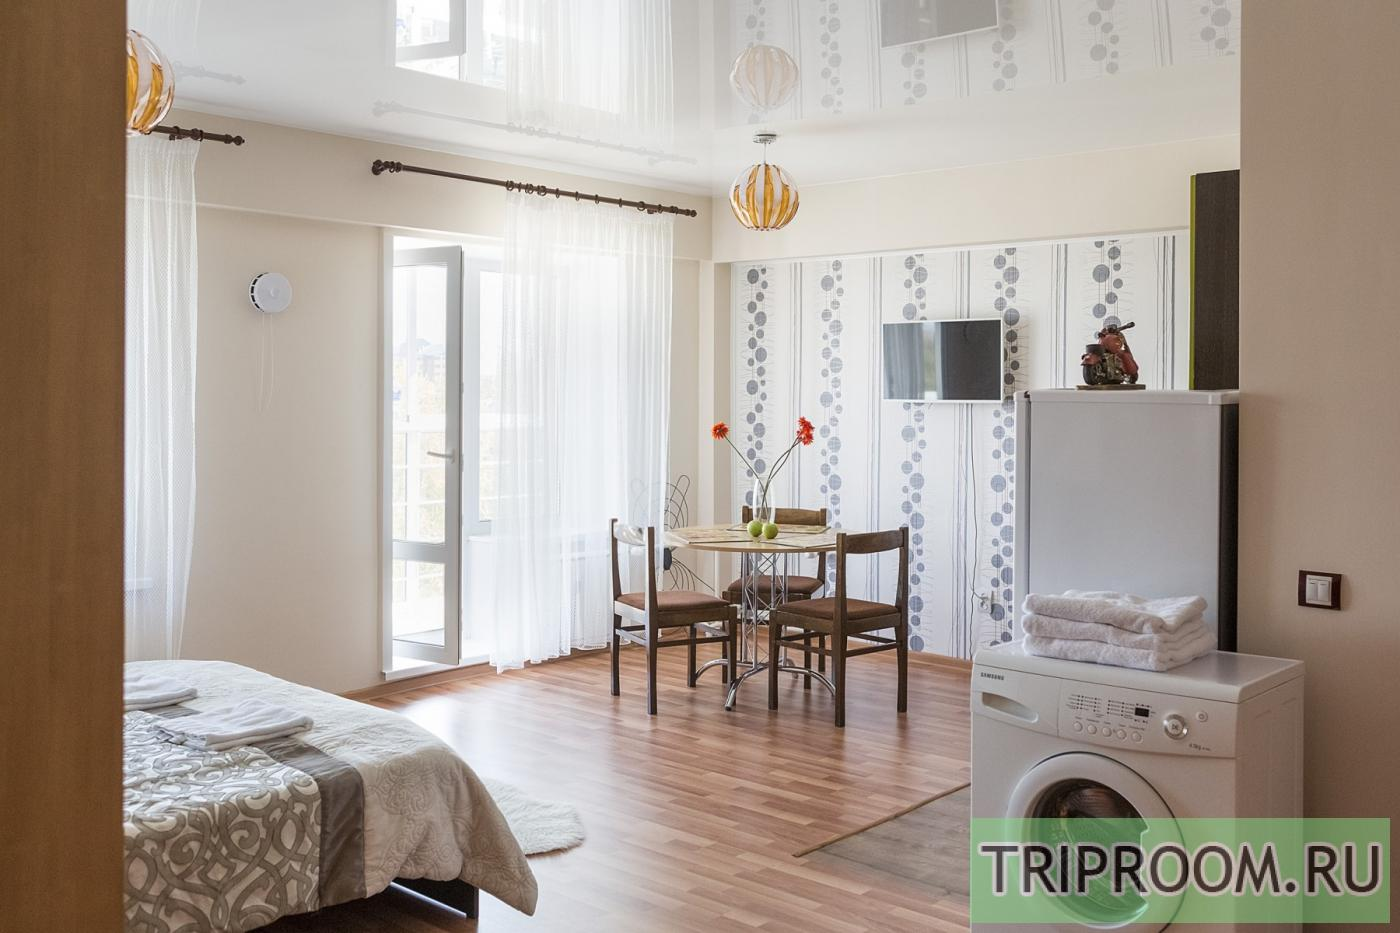 1-комнатная квартира посуточно (вариант № 35709), ул. Ядринцева улица, фото № 1